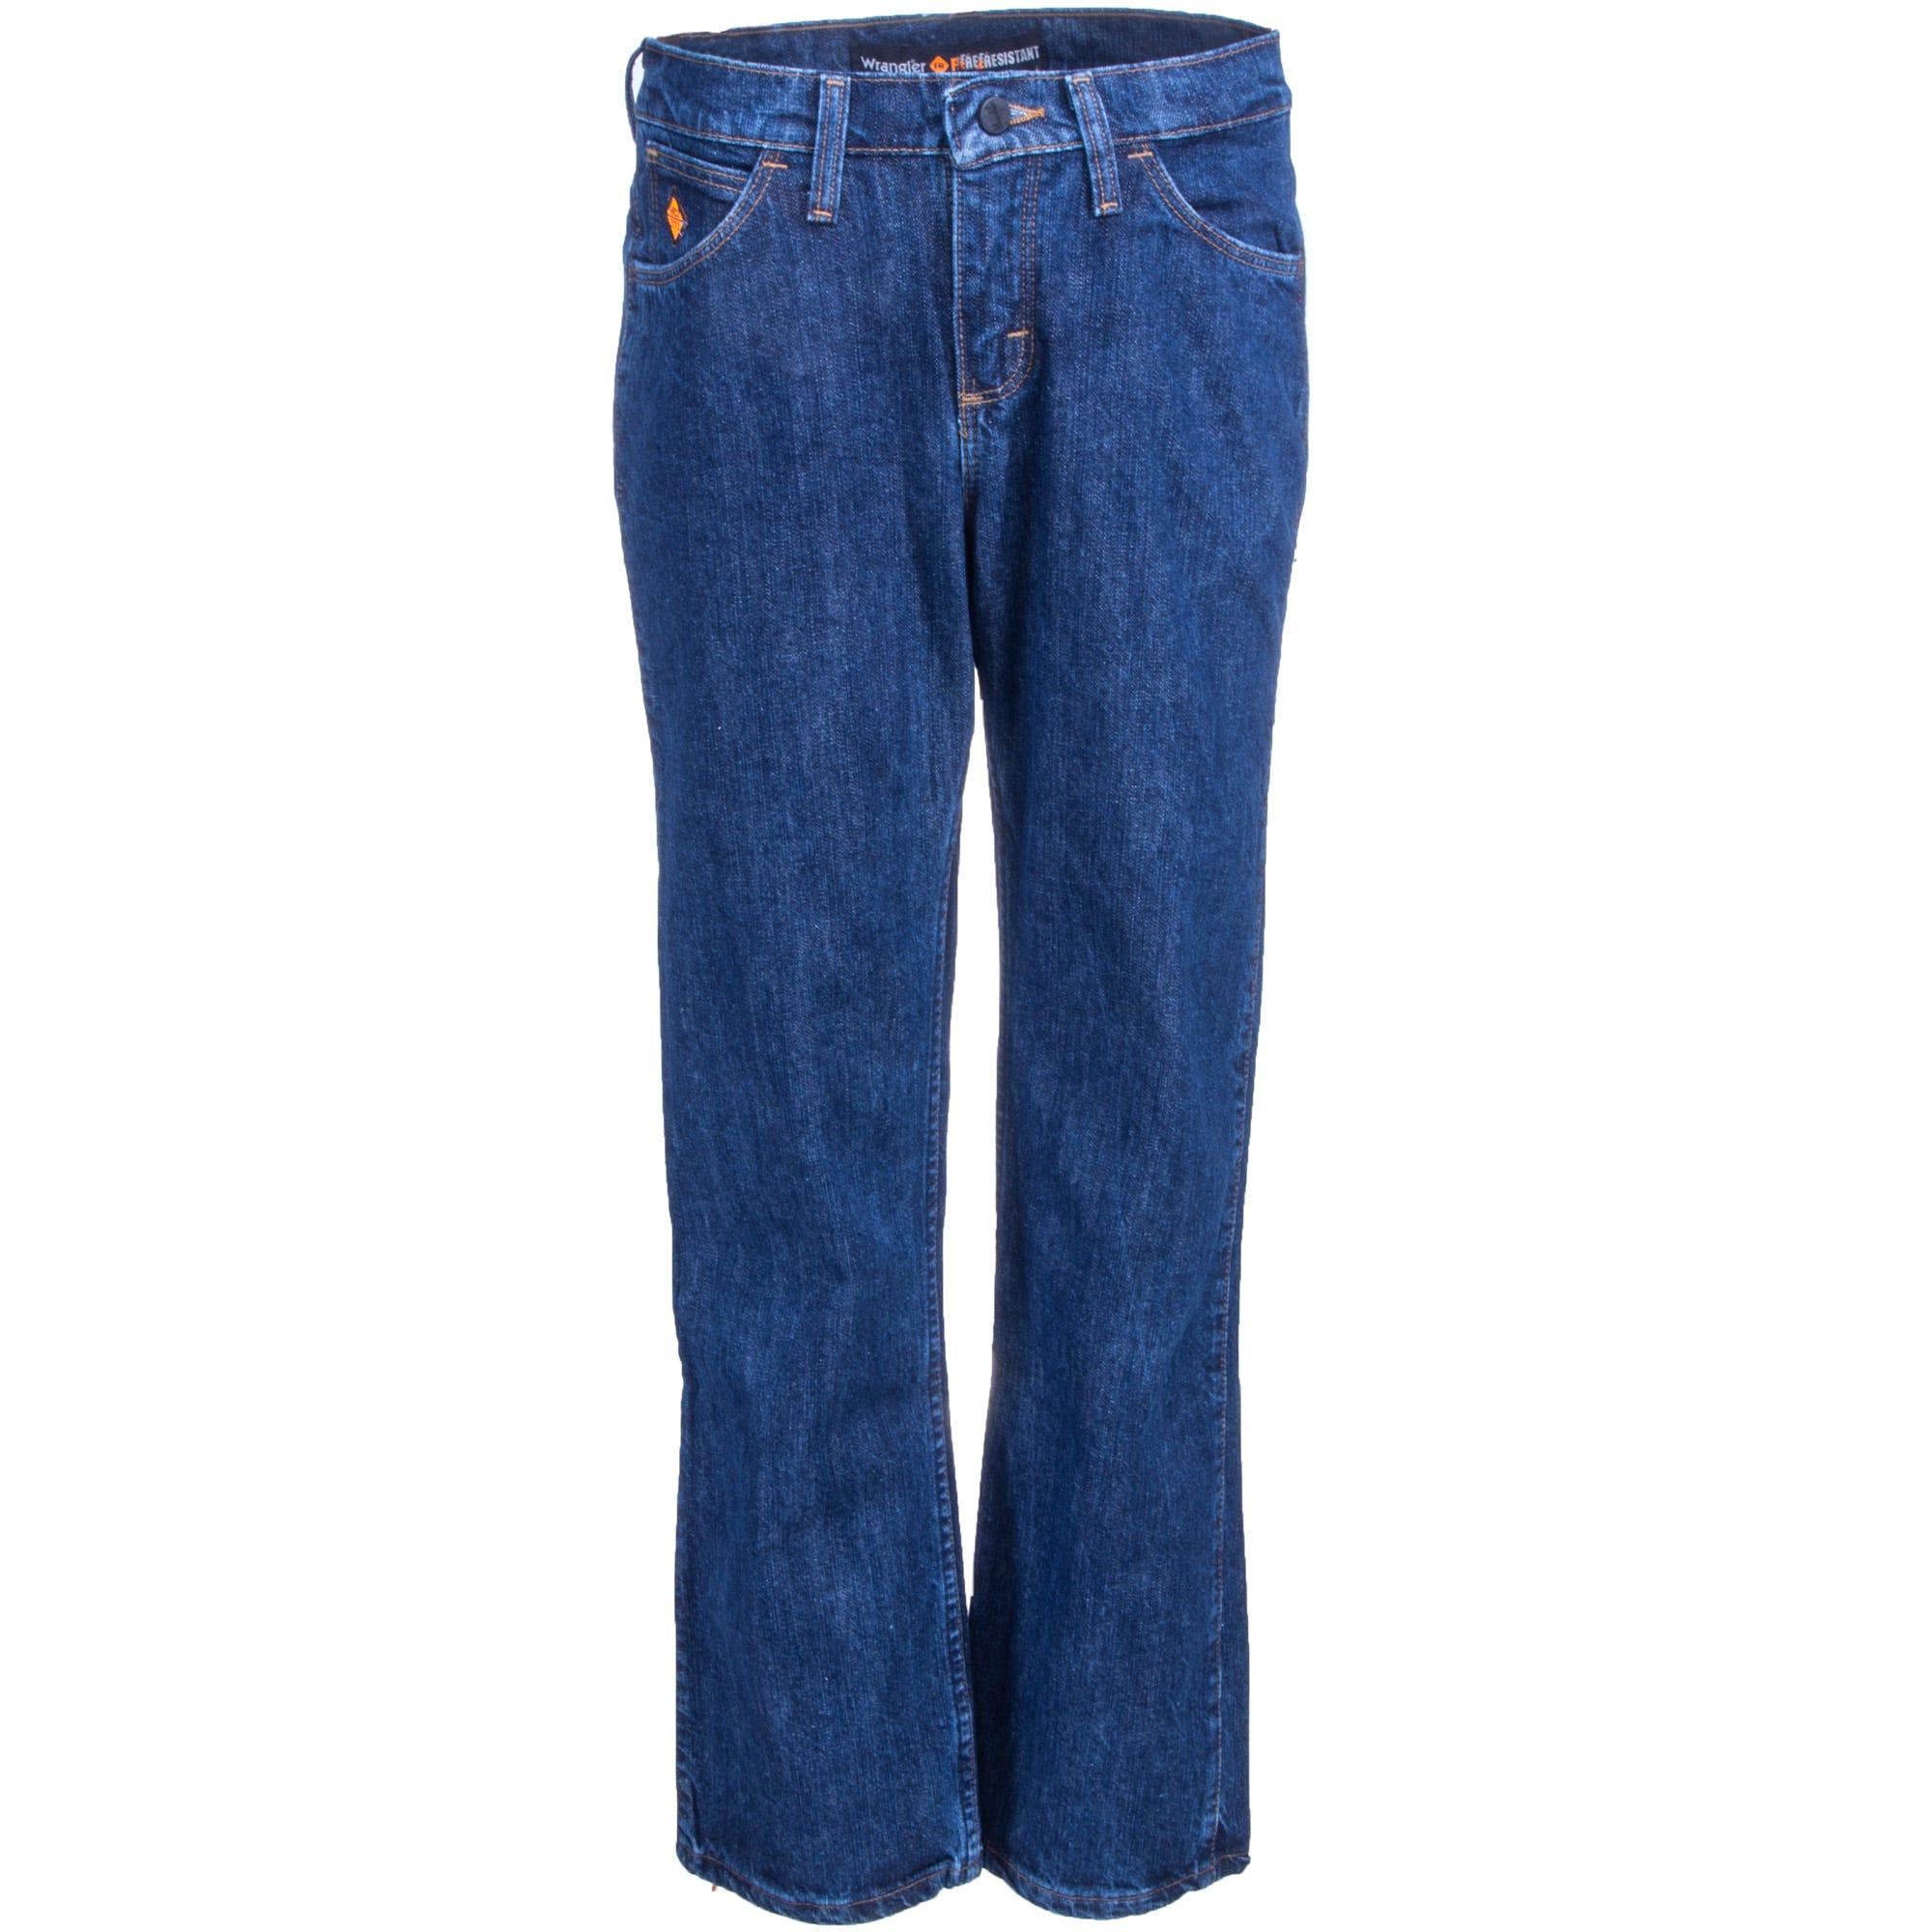 Wrangler Women's Dark Denim FRW10DD Flame Resistant Relaxed Fit Work Jeans